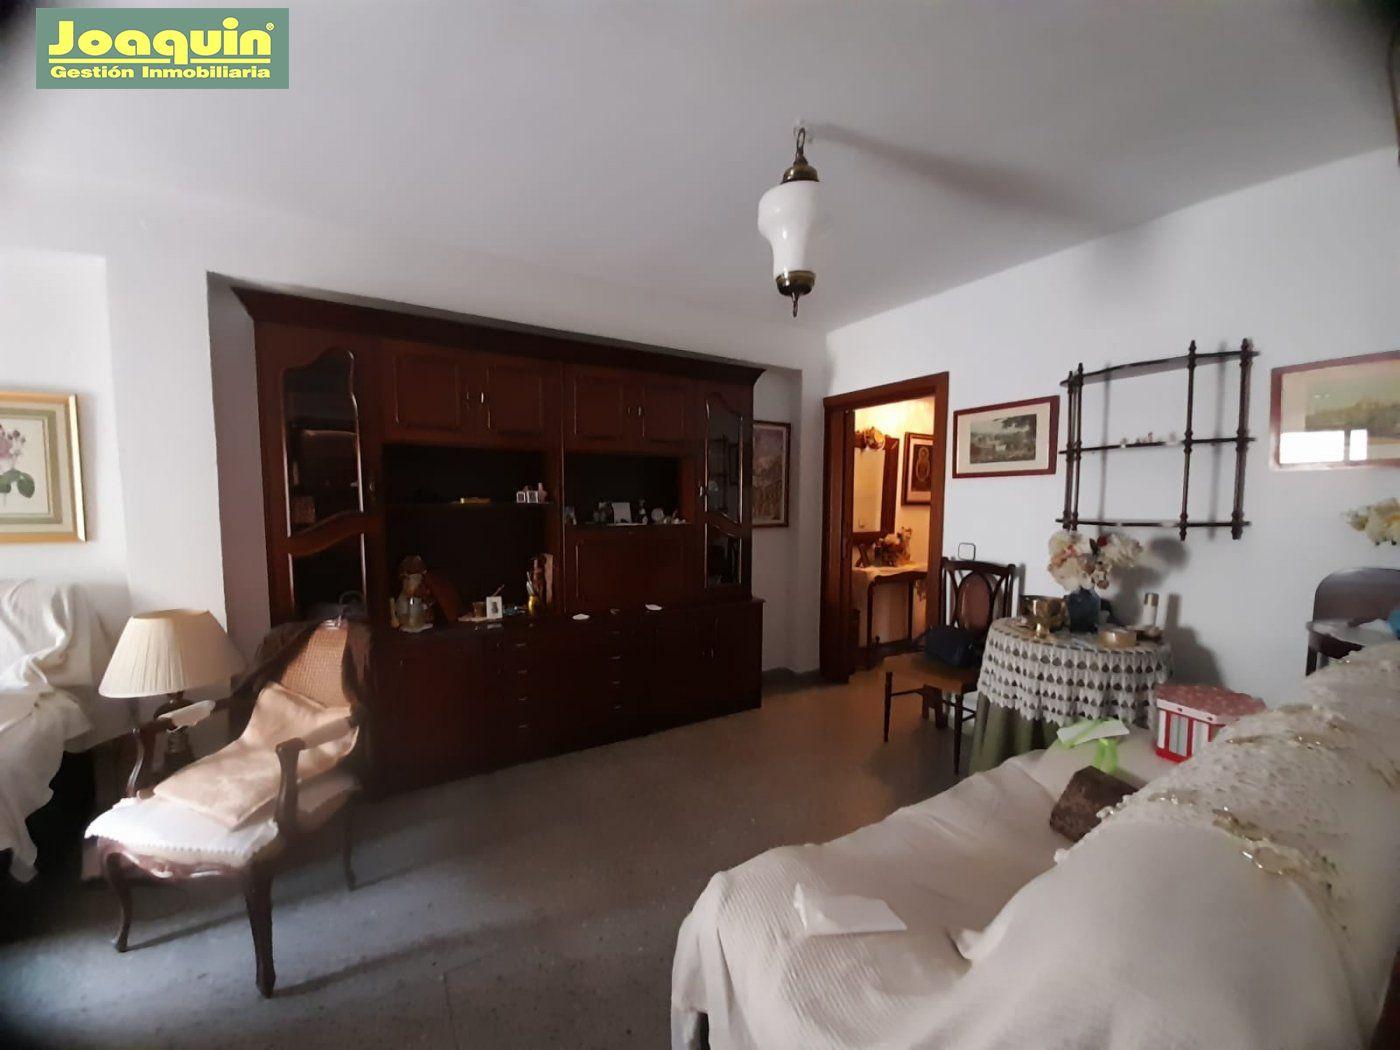 Vivienda  Fidiana Córdoba | Inmobiliaria Joaquín